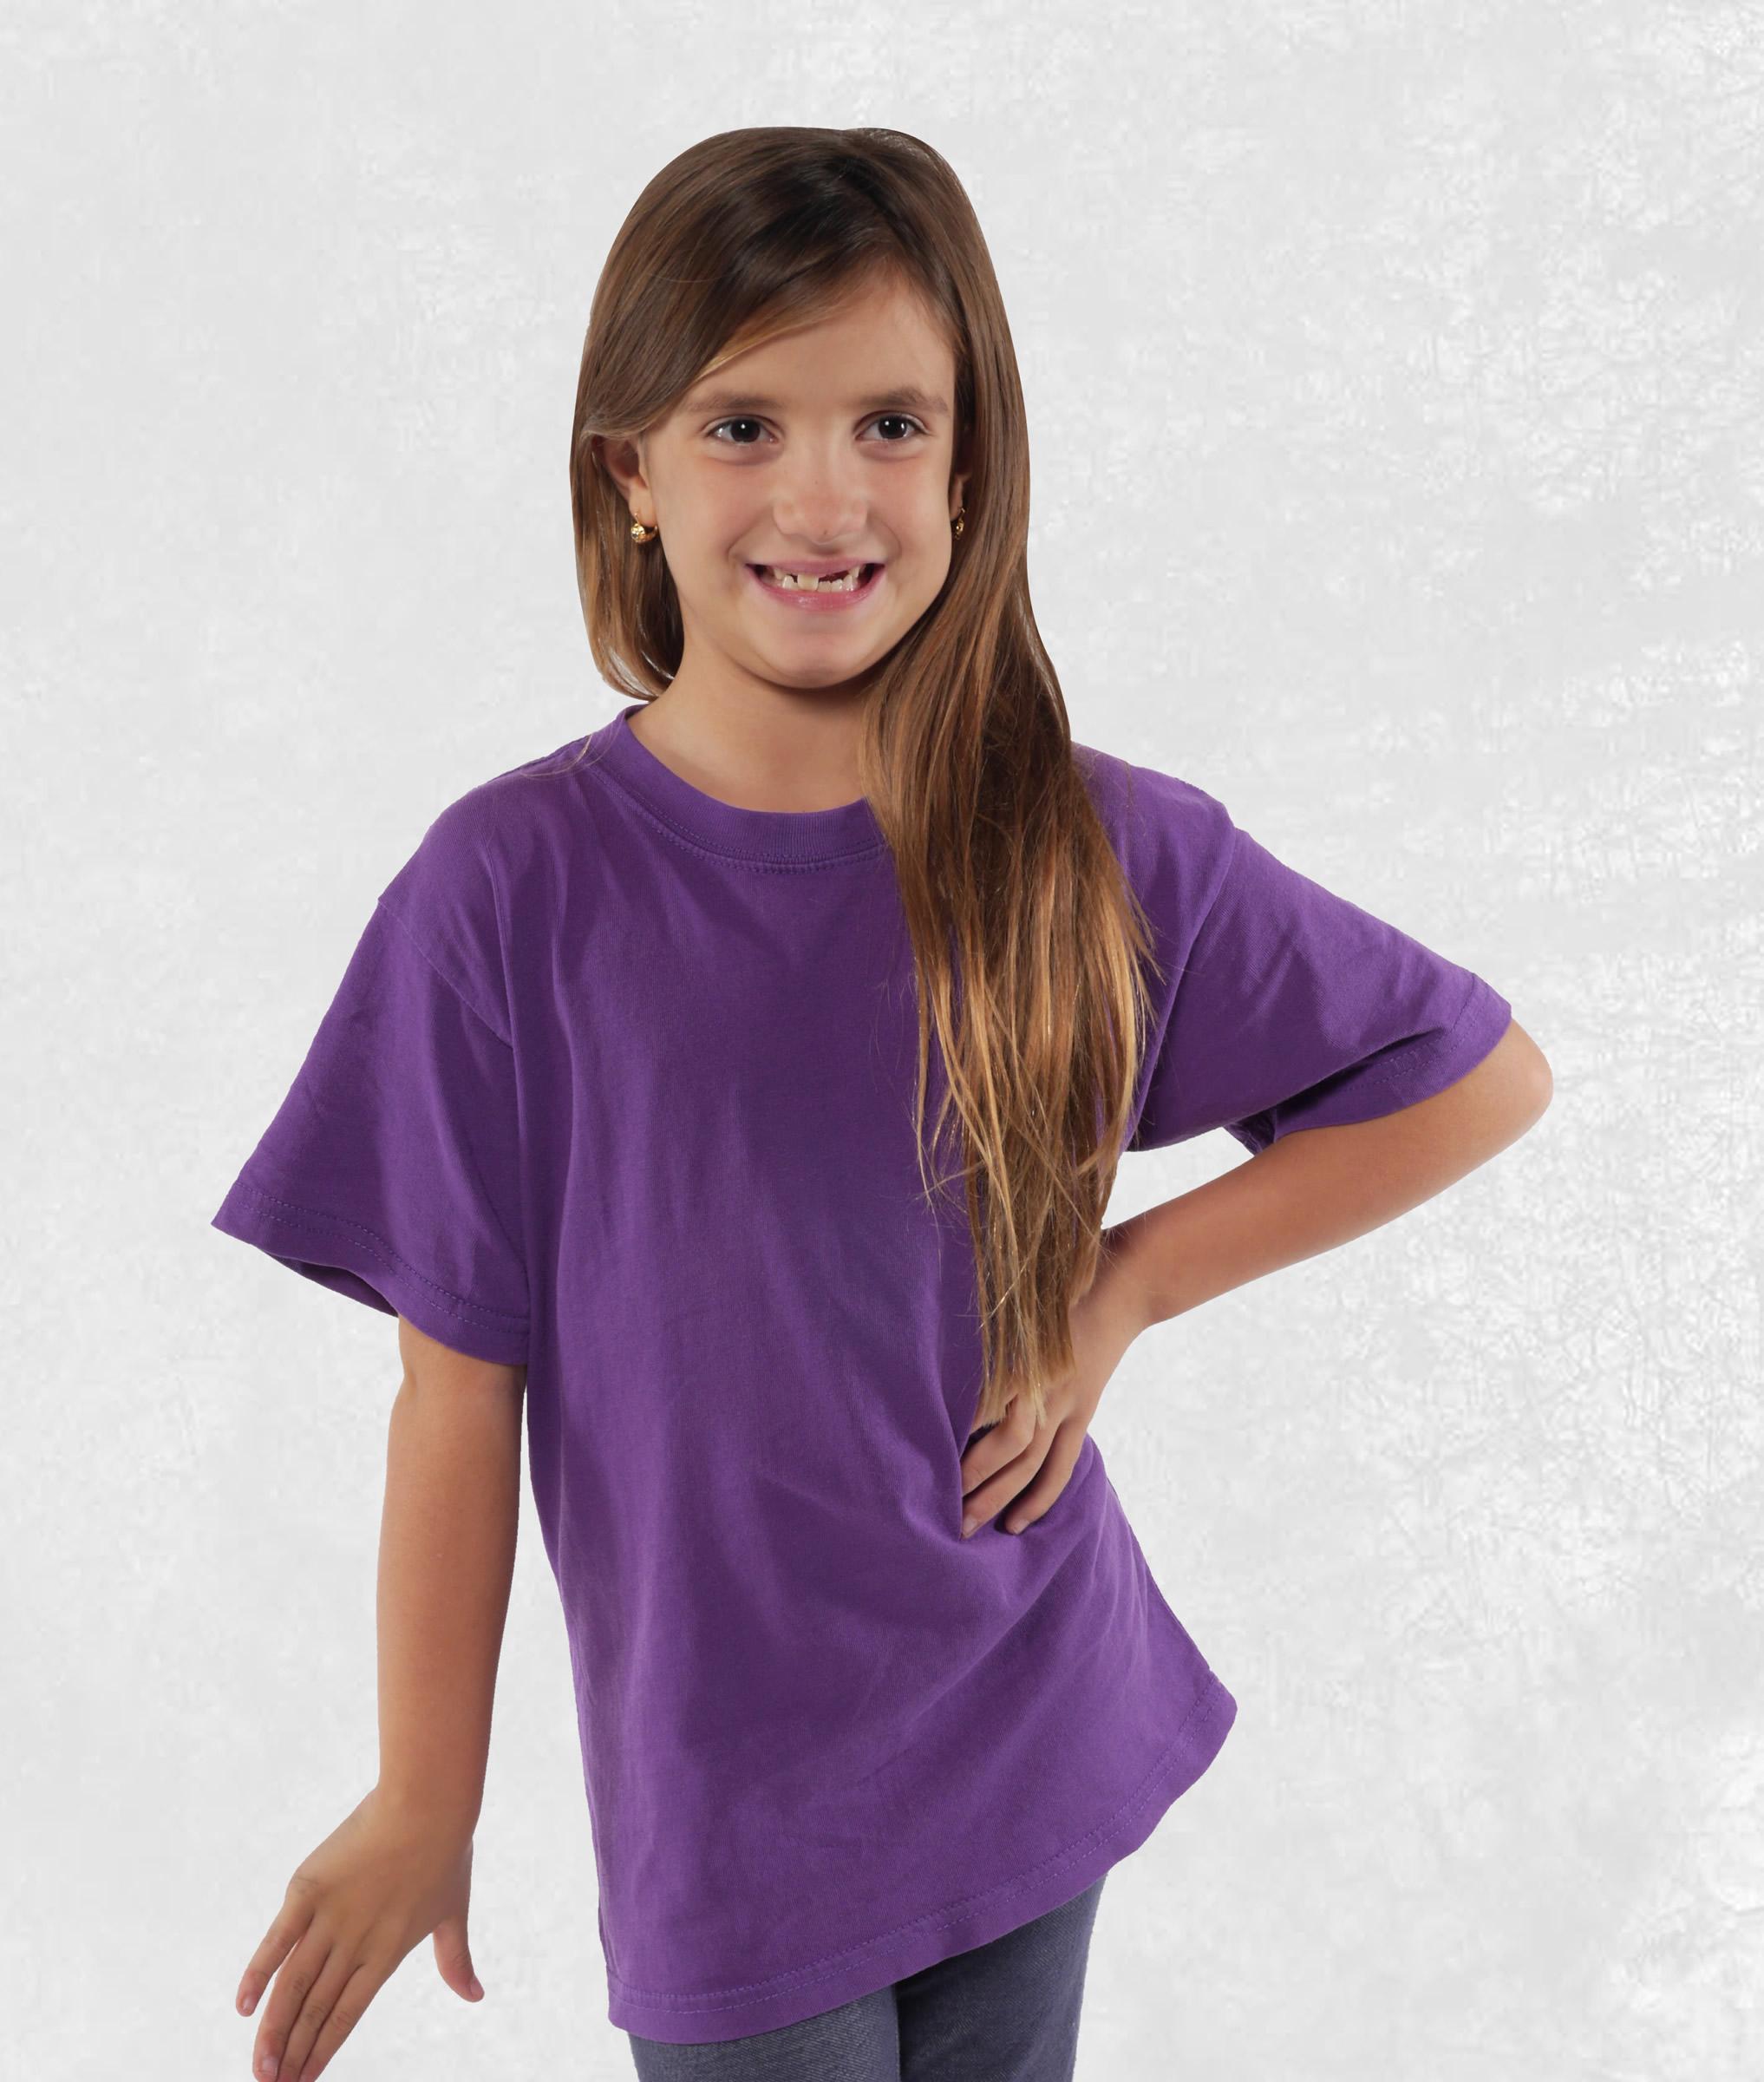 Neon Purple Youth Short Sleeve Tees